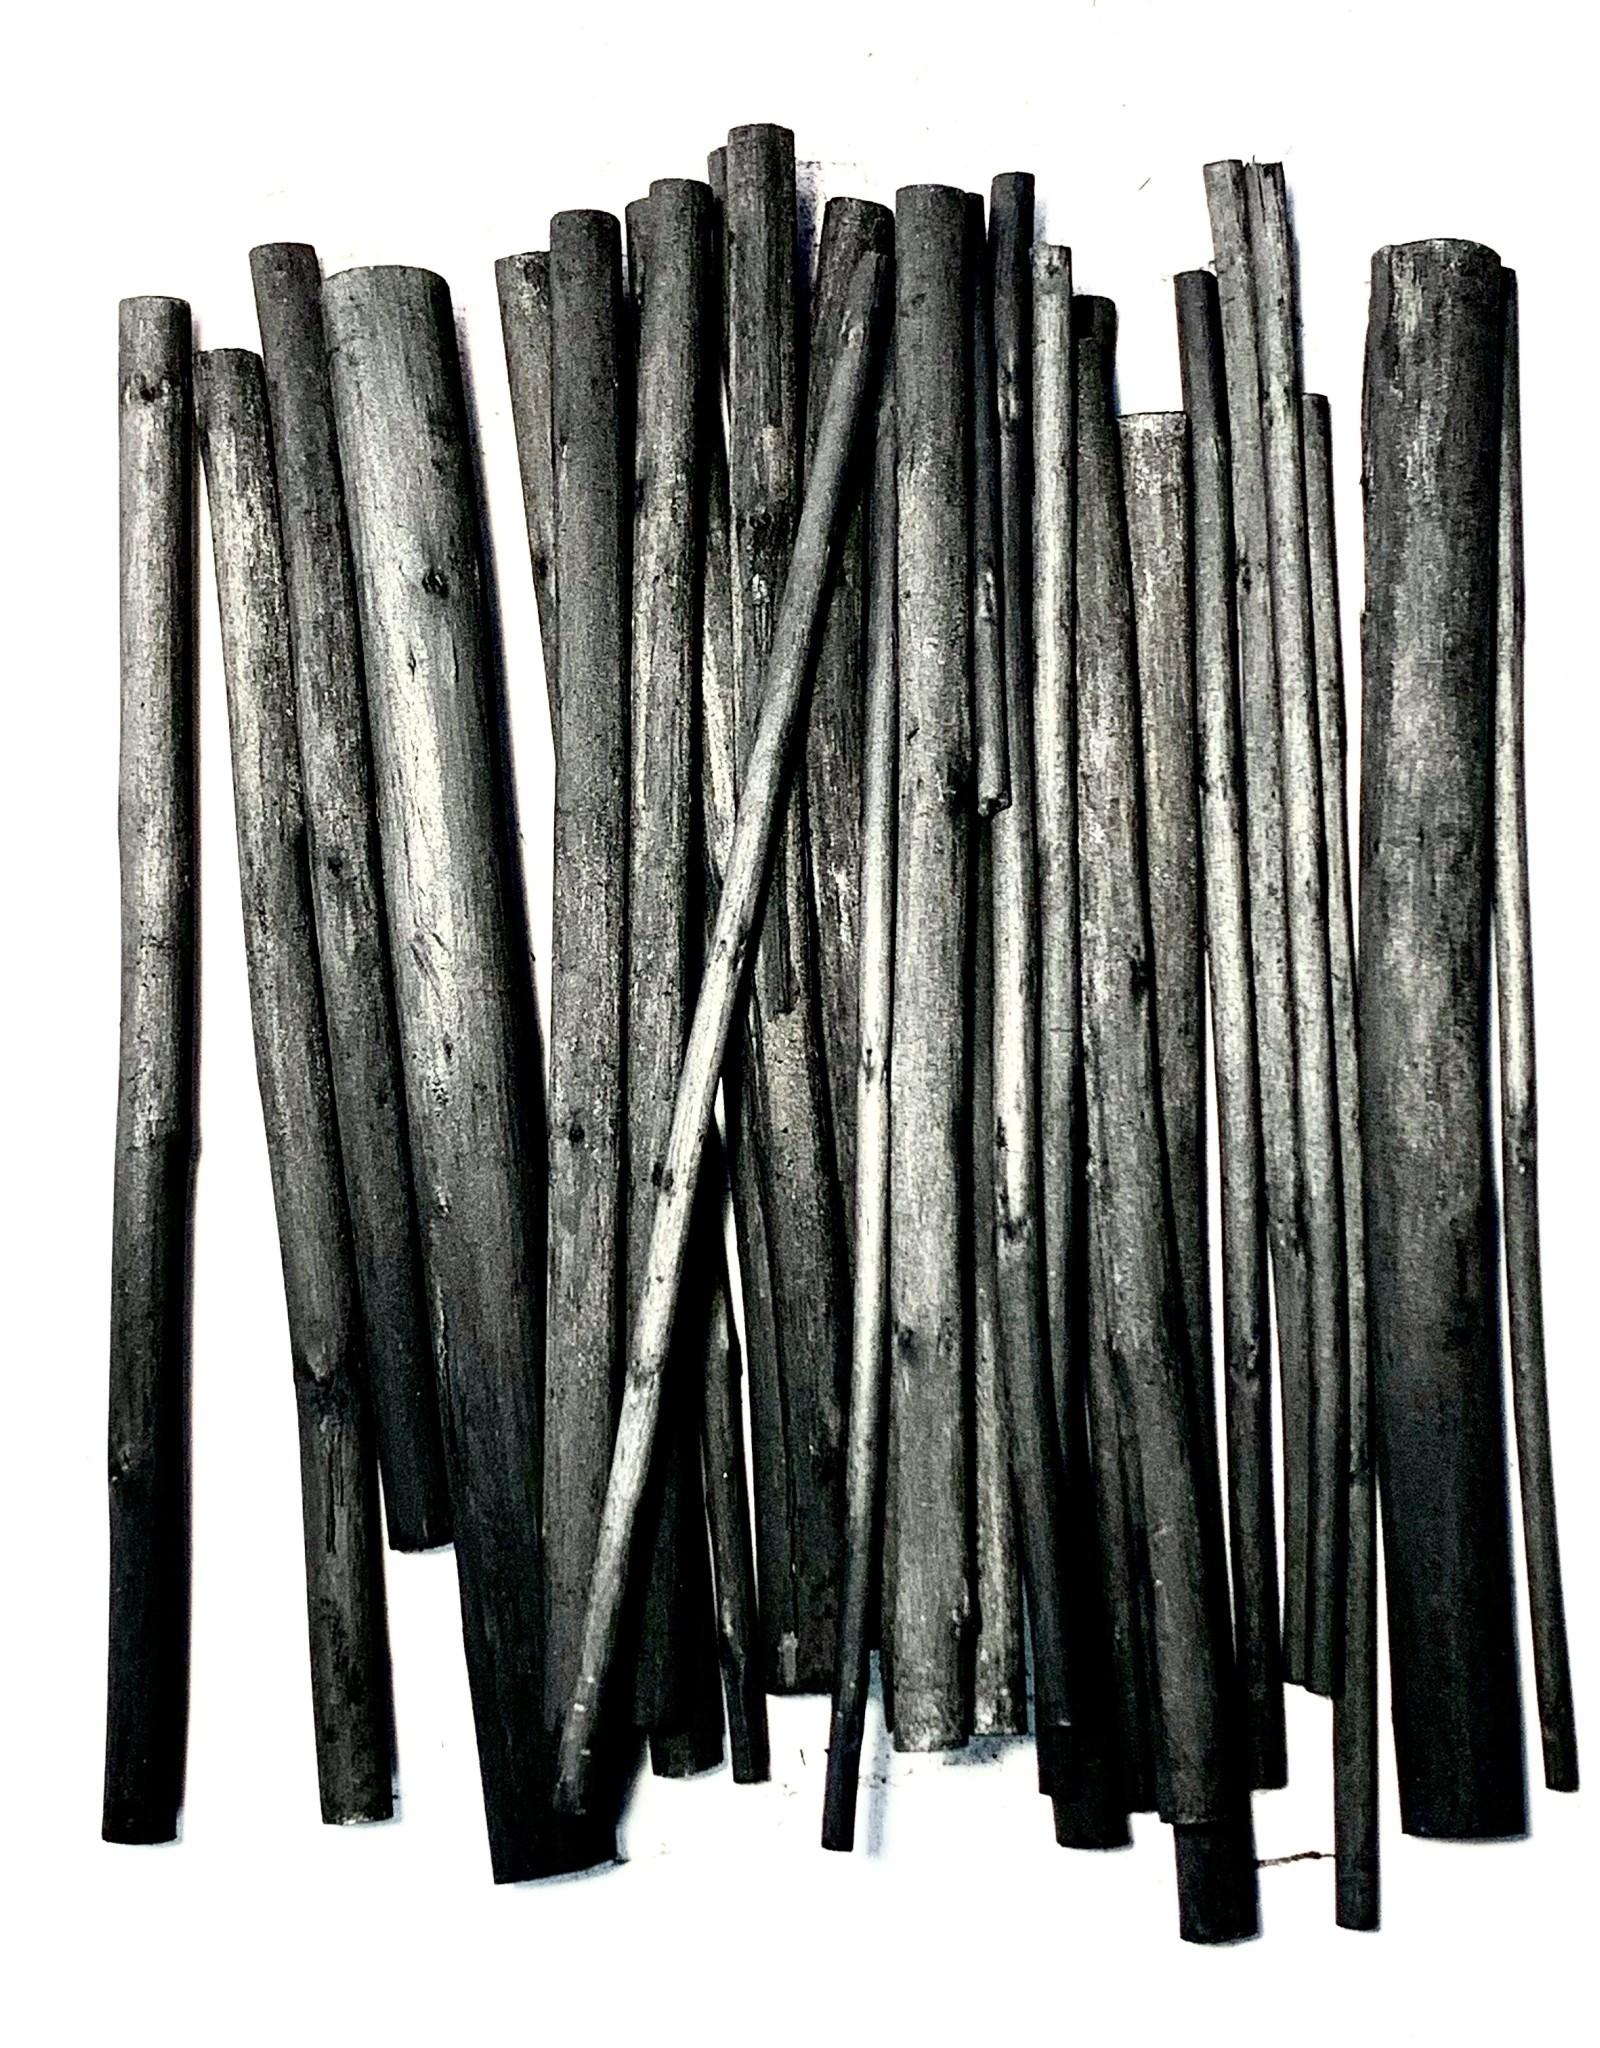 Willow Charcoal, 4mm-12mm Asst. Willow Charcoal Sticks- 30pcs Assorted